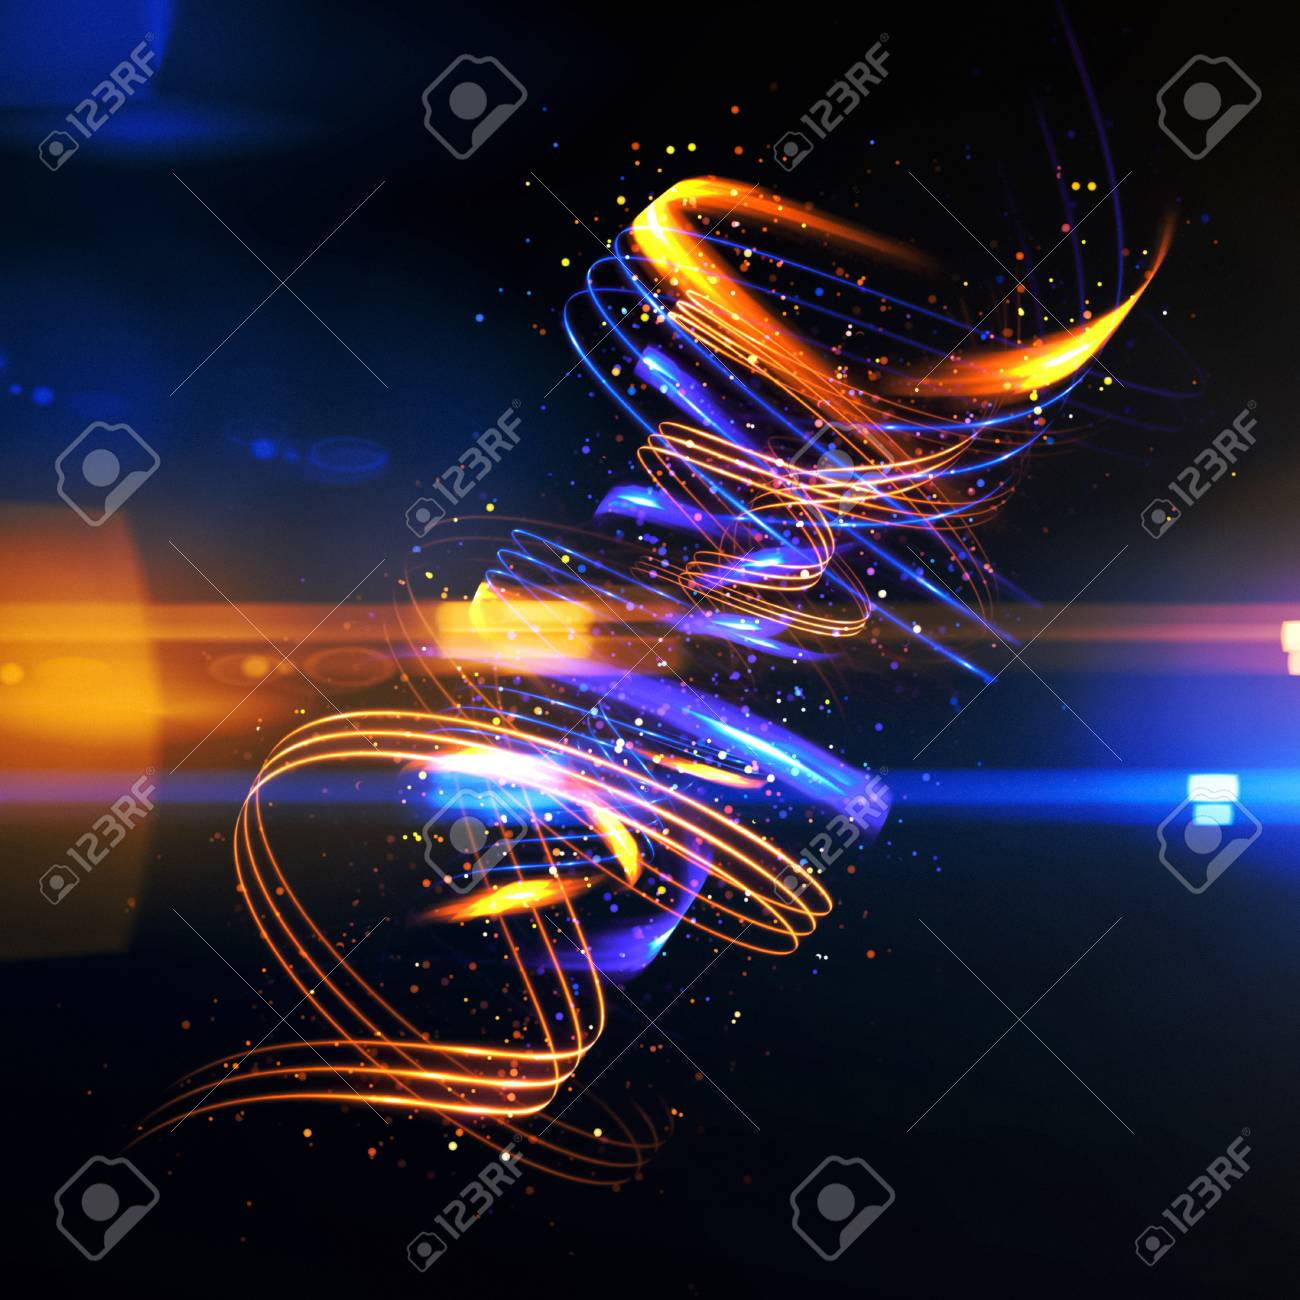 Glow Swirl Lichteffekt. Kreisförmige Blendenflecke. Abstrakte ...